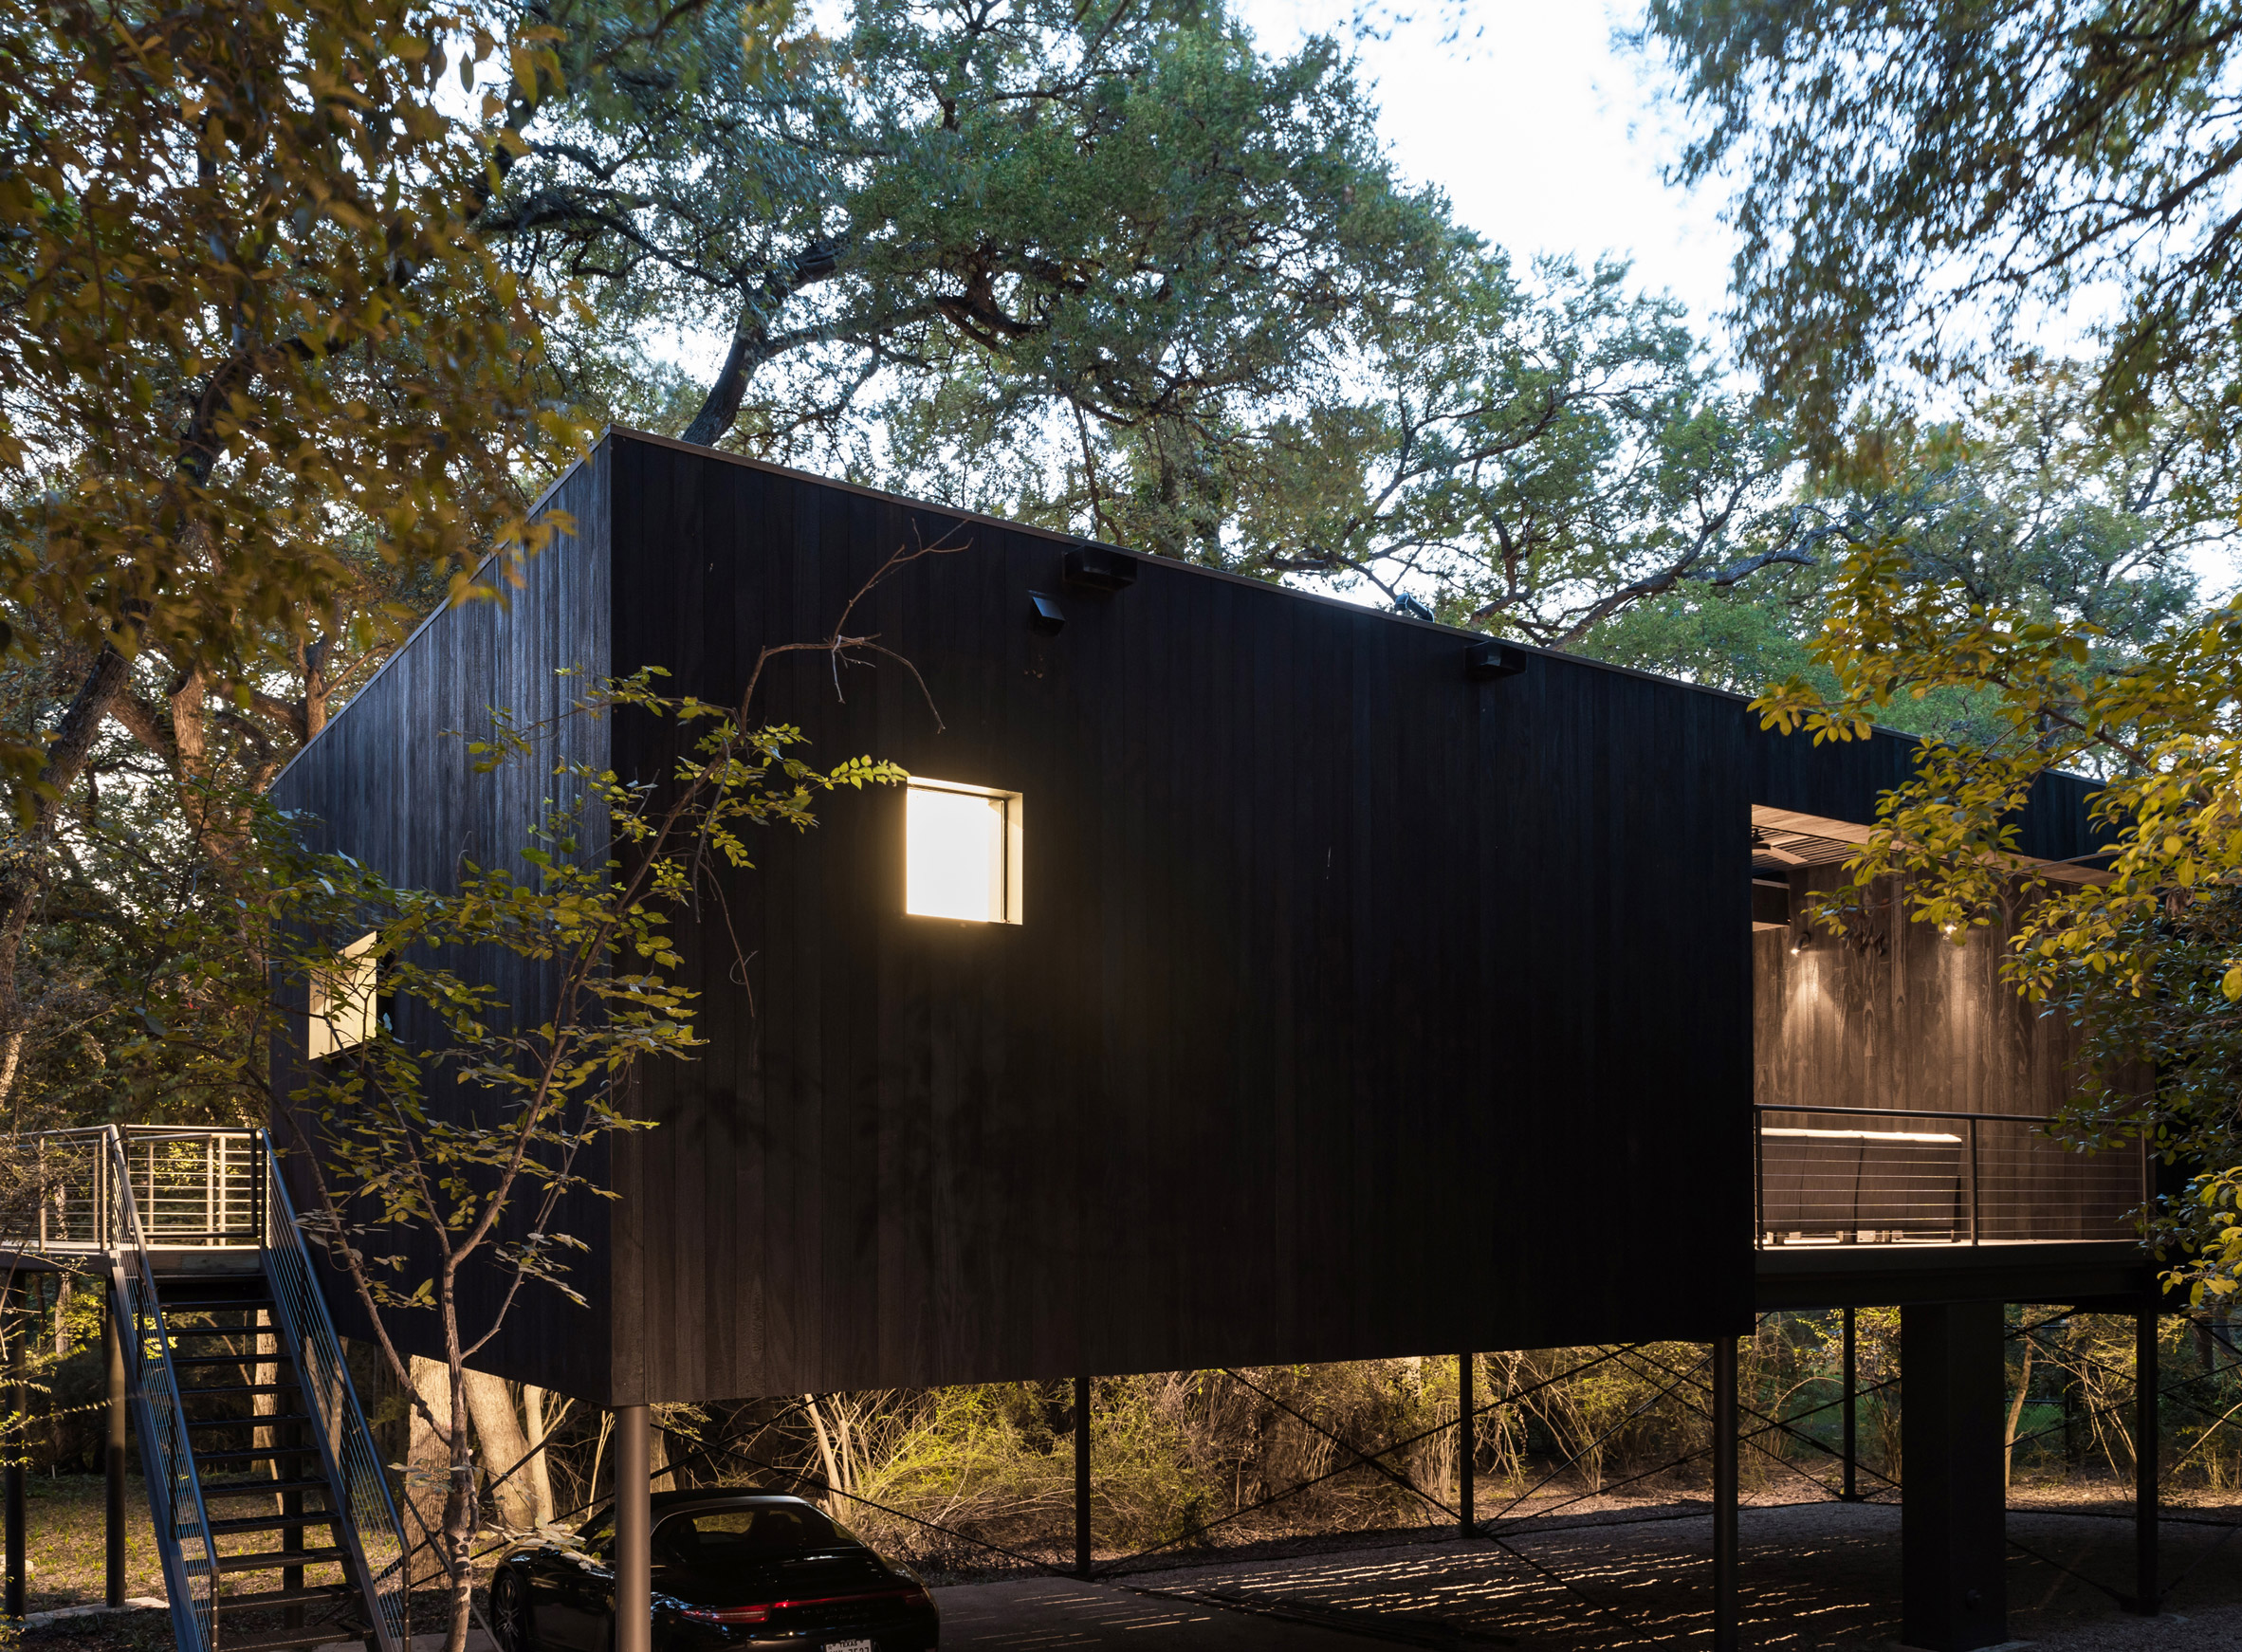 PH2 Treebox by Wernerfield